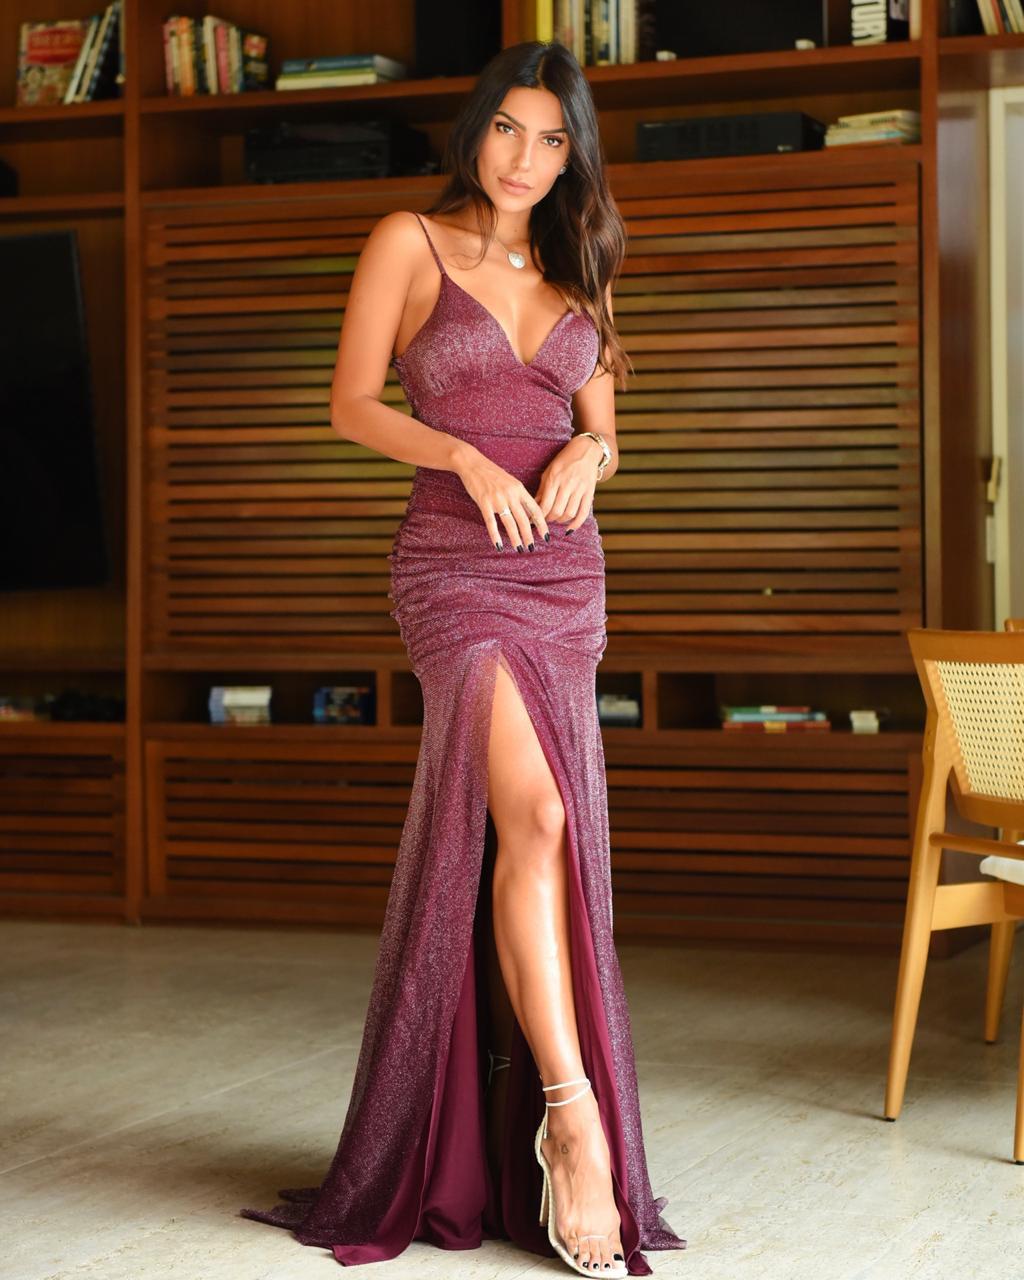 Vestido Aparecida  - Empório NM